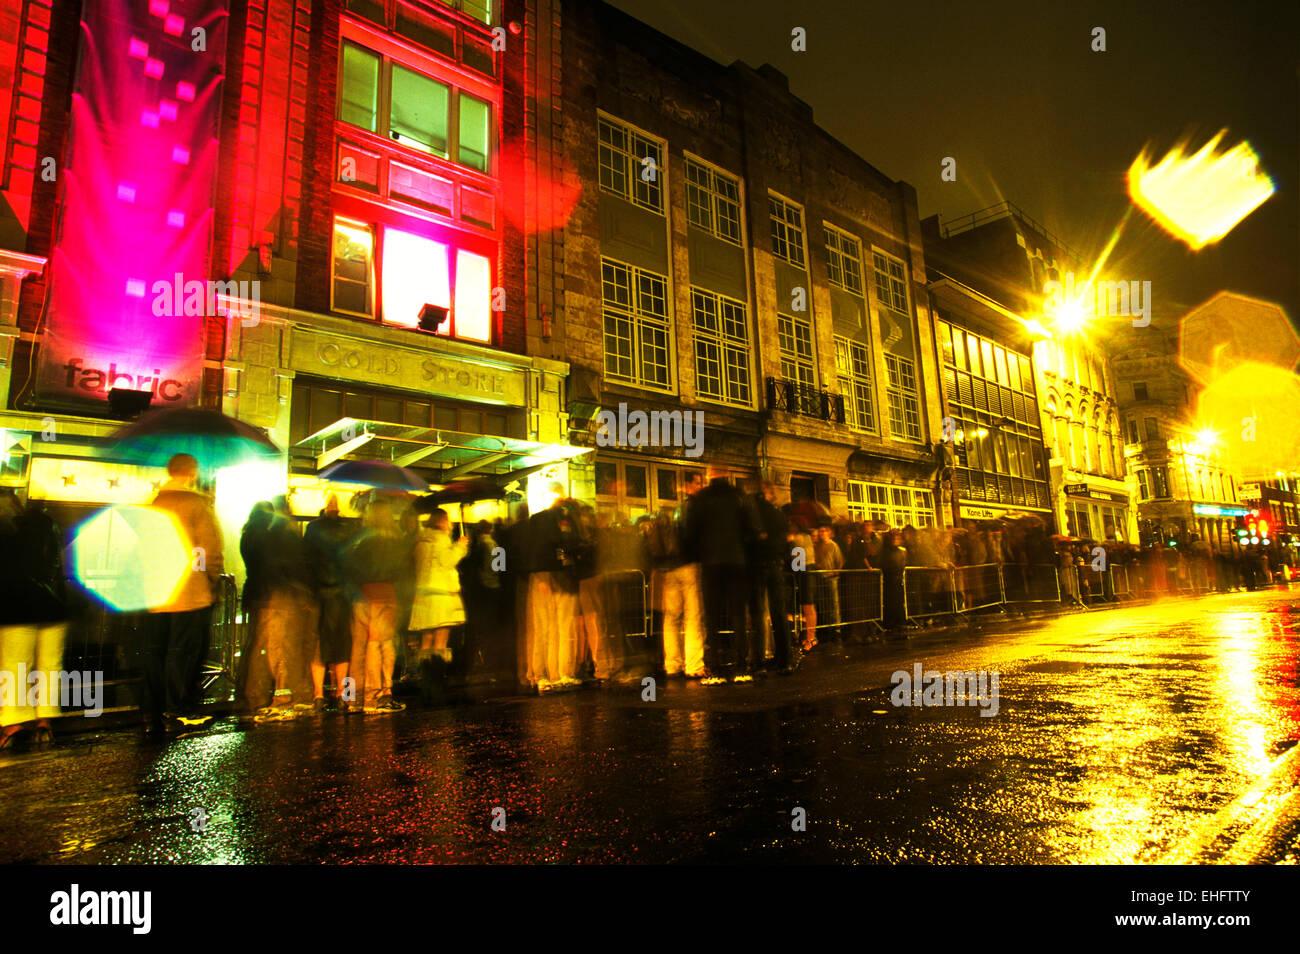 My House Nightclub Stock Photos & My House Nightclub Stock Images ...